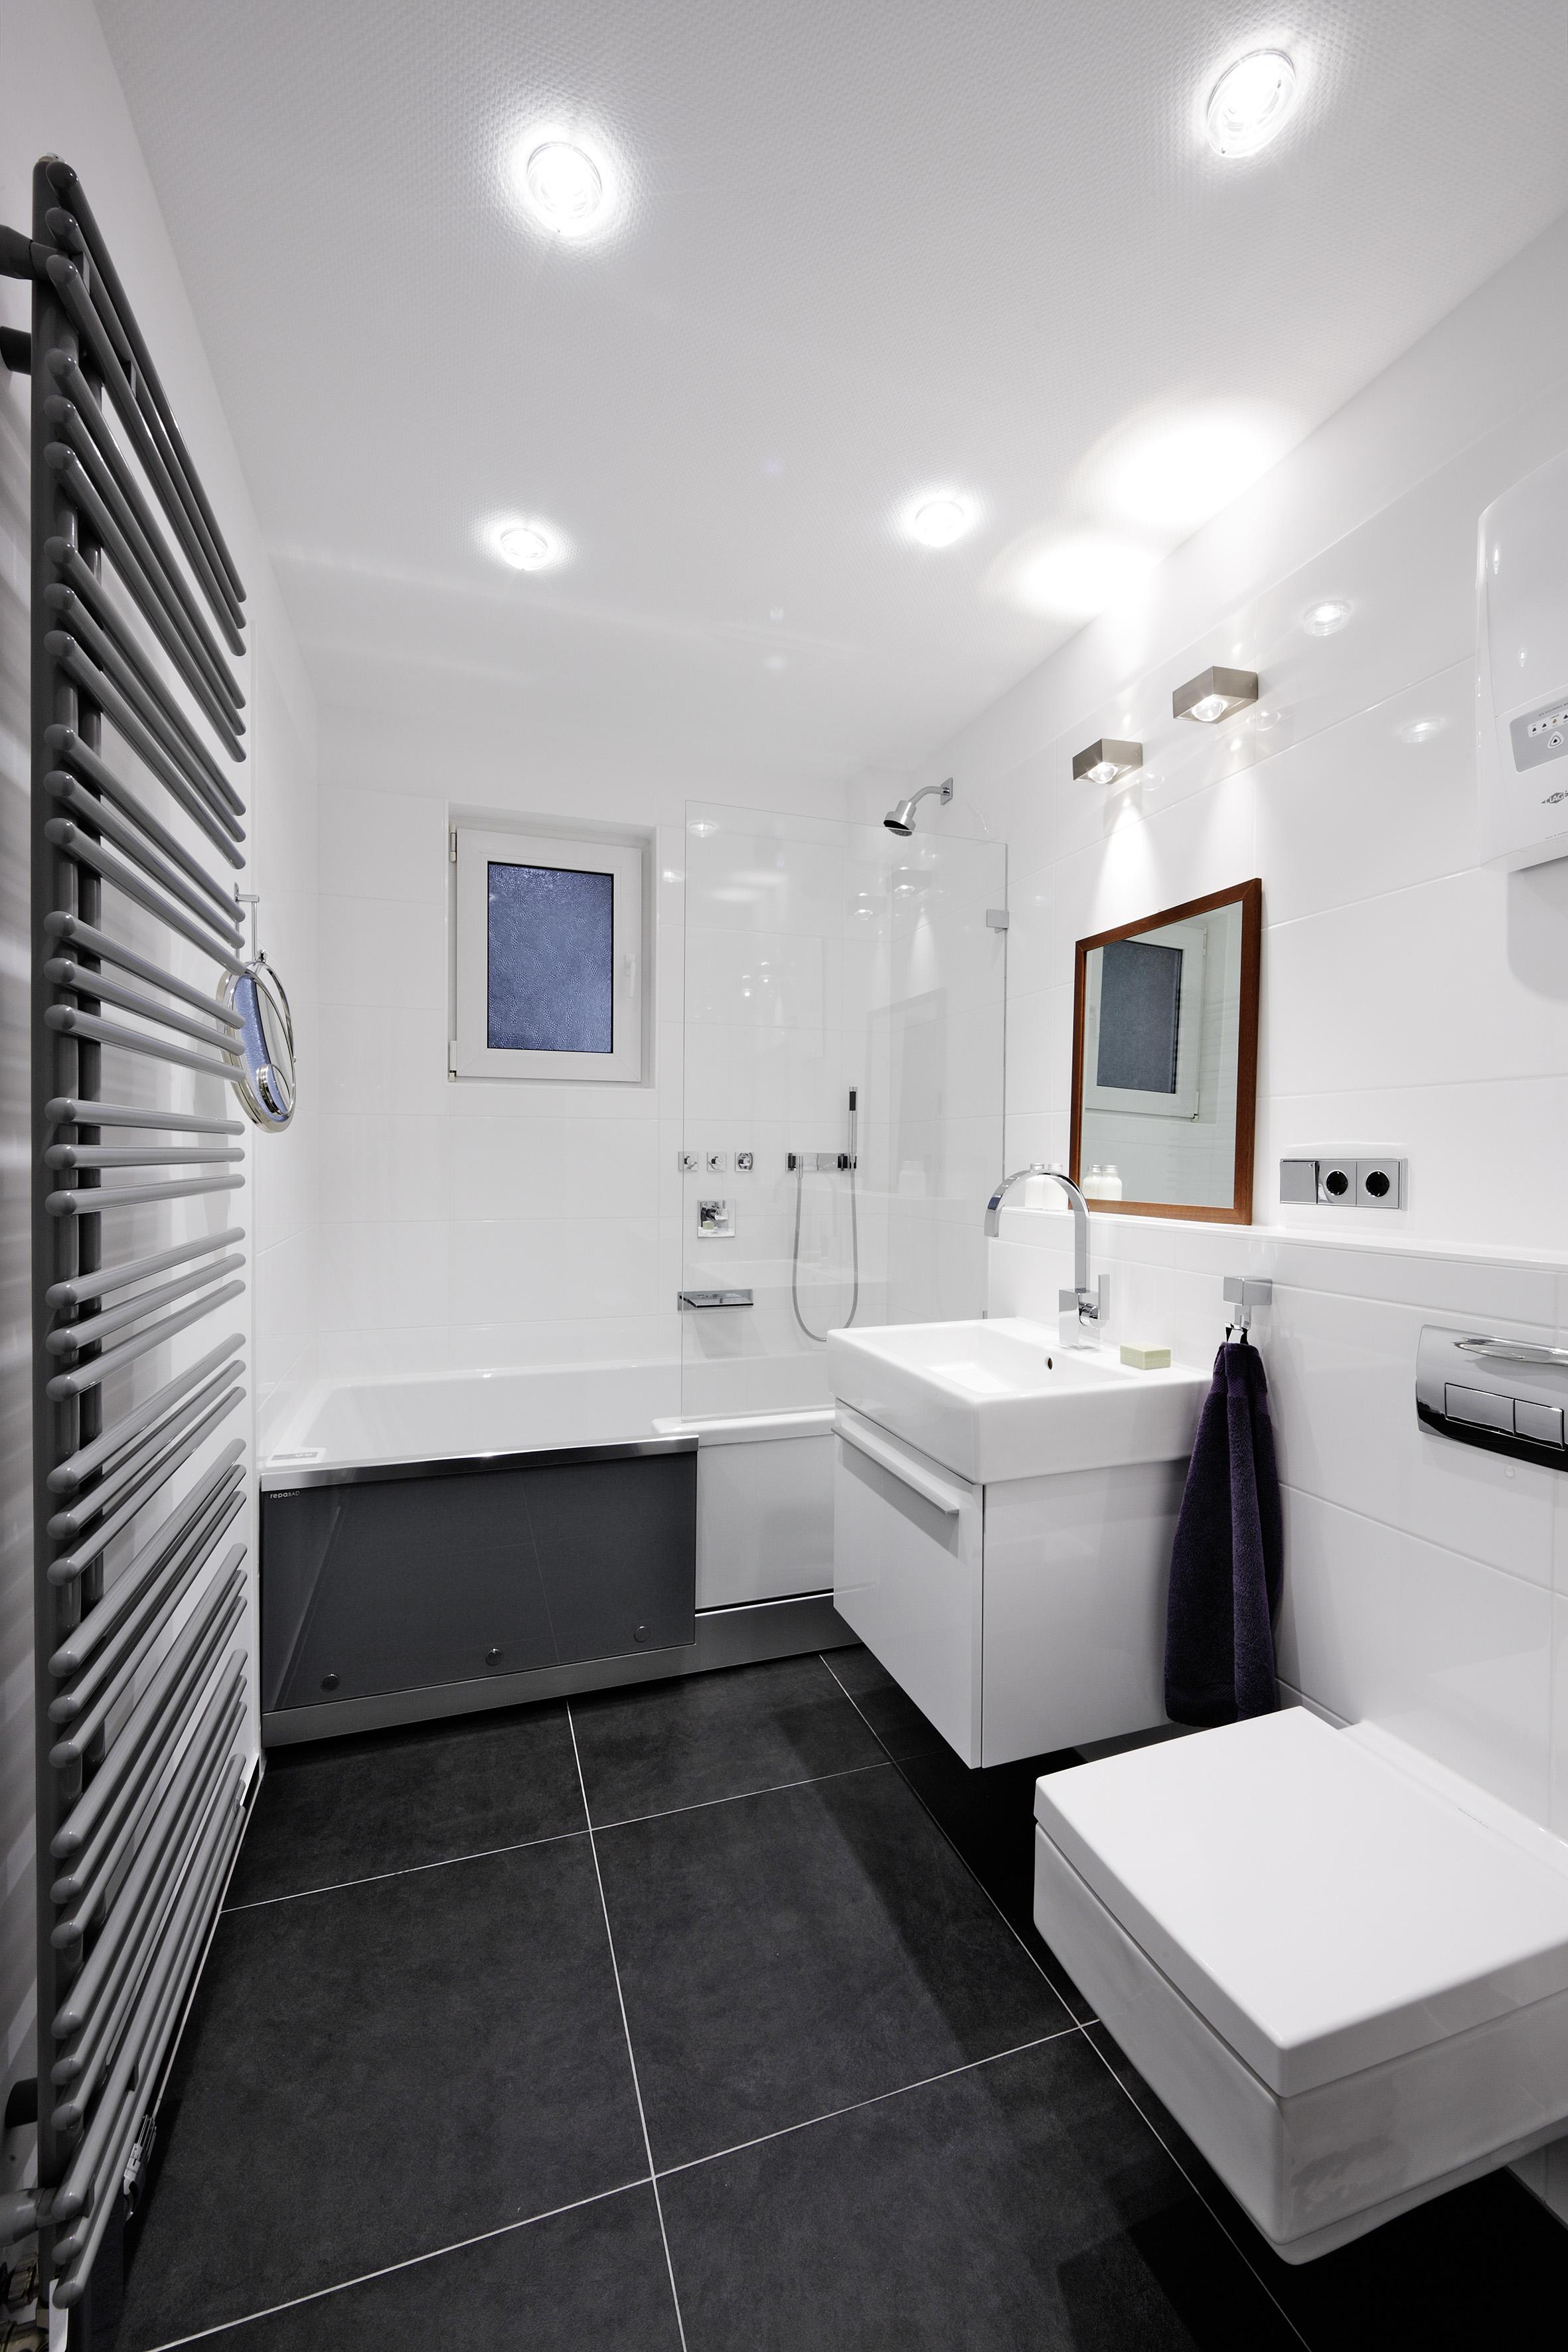 repabad easy in badewanne 170 t r rechts nischeneinbau peter peters viktor wiebe gbr. Black Bedroom Furniture Sets. Home Design Ideas